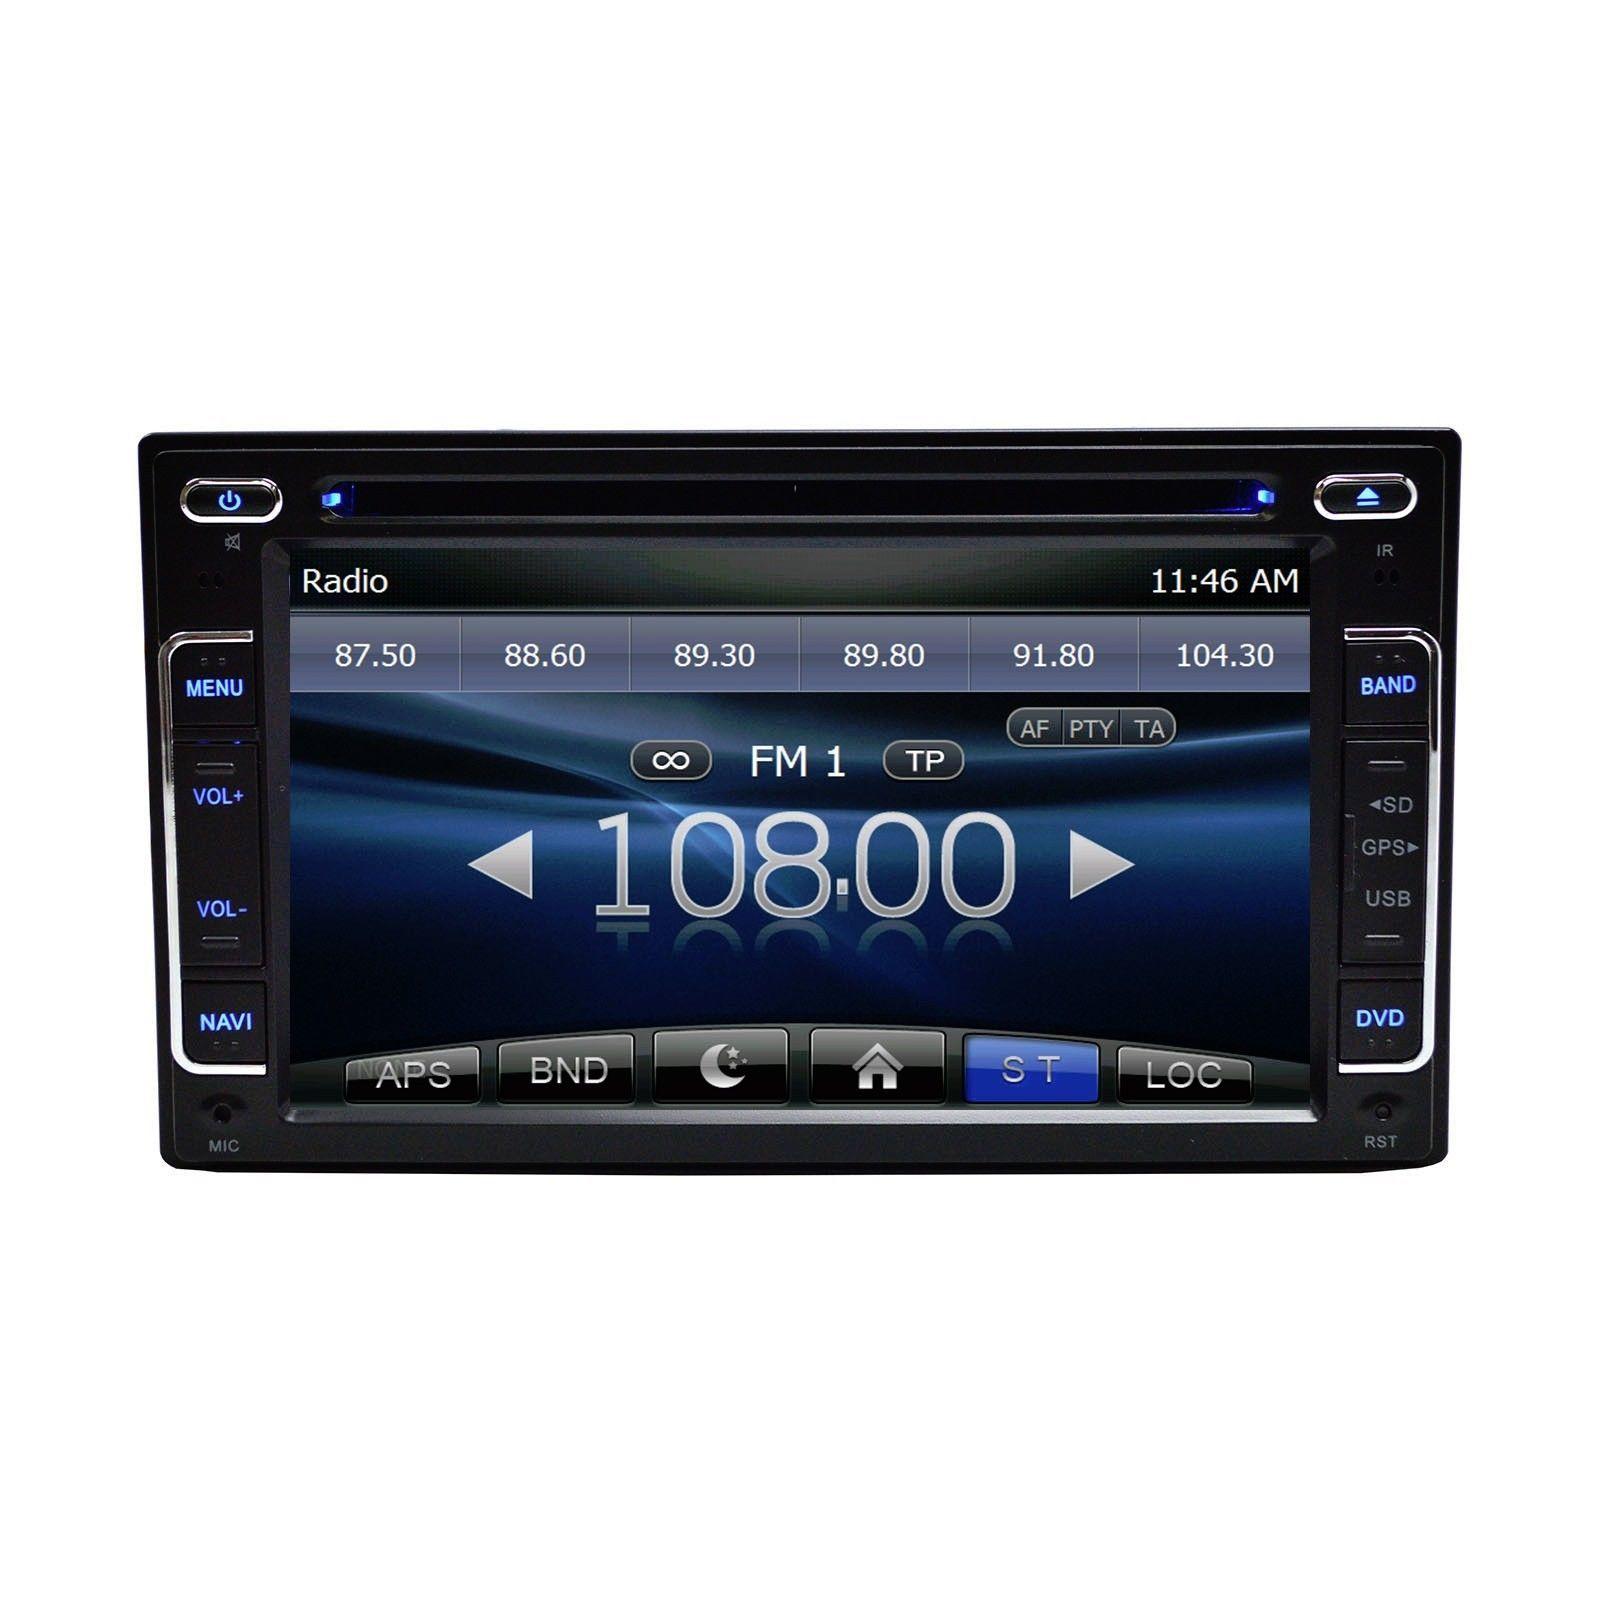 IN DASH OE DIRECT PLUG AND PLAY GPS BLUETOOTH DVD RADIO FOR HYUNDAI SANTA FE